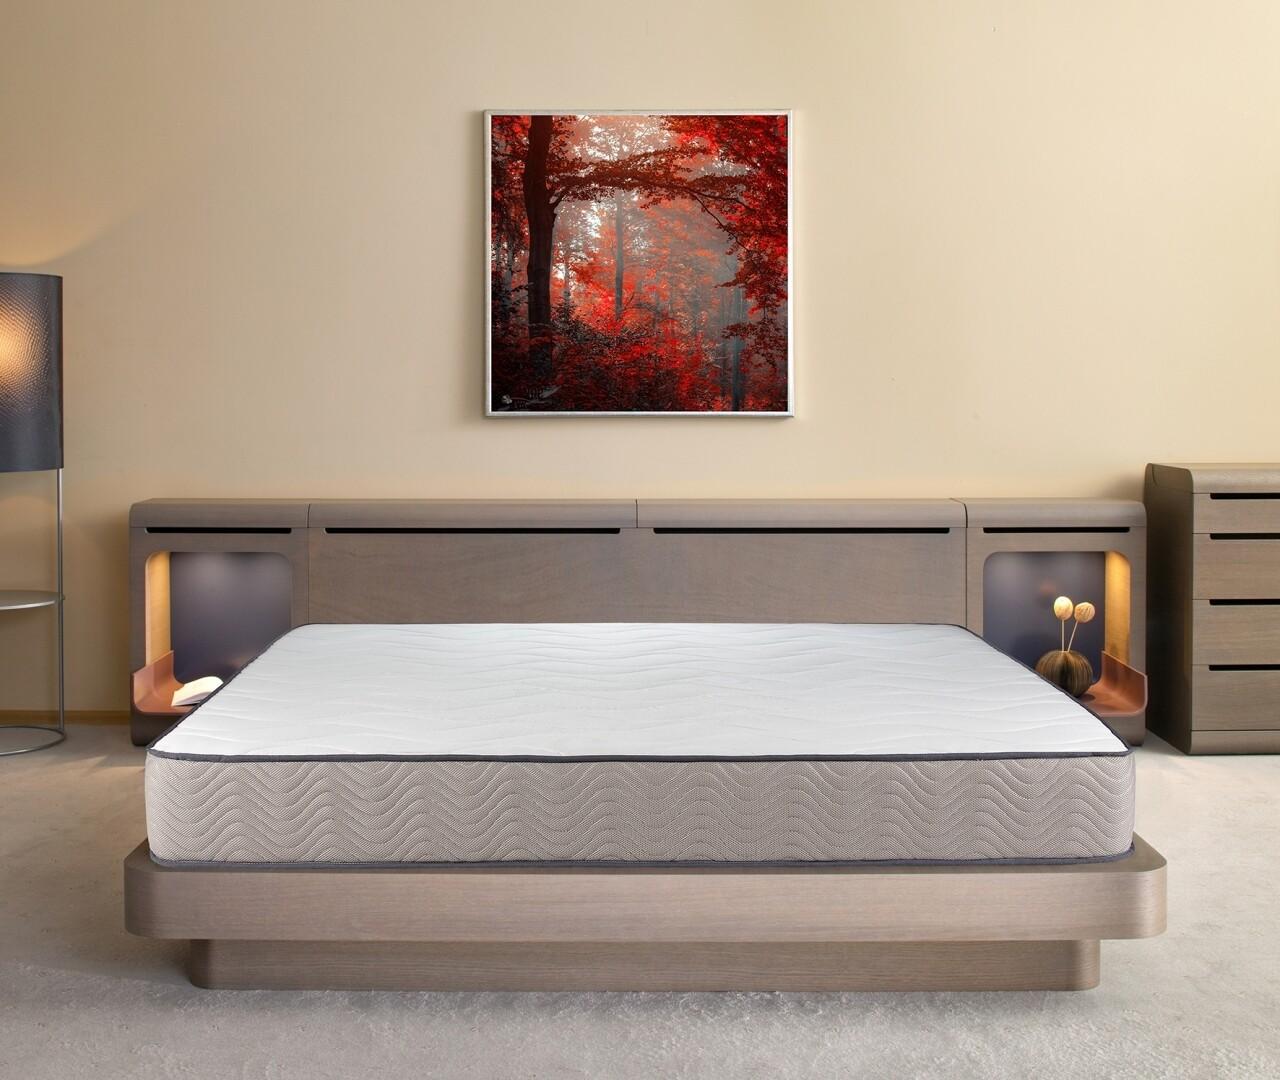 Saltea Bedora, Fresh Memory Grey Line, Ortopedica, Anatomica 160 x 200 cm